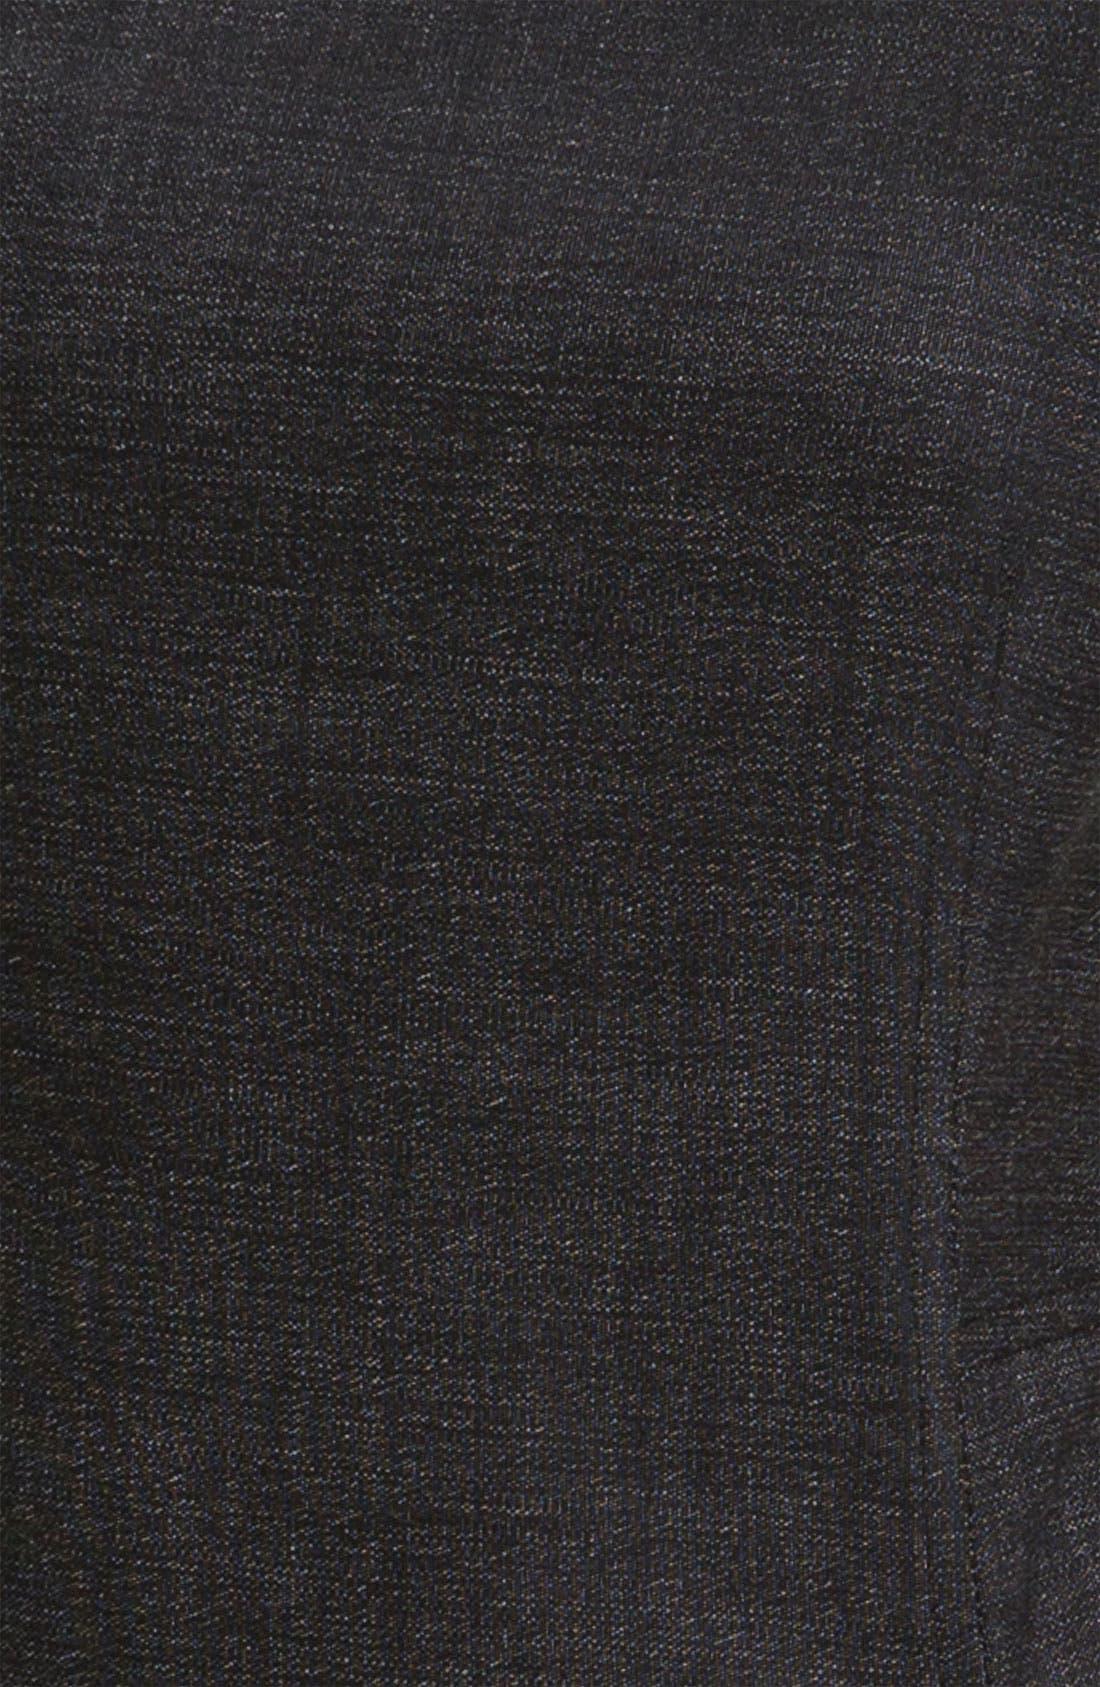 Alternate Image 3  - Theory 'Nuriana' Sheath Dress